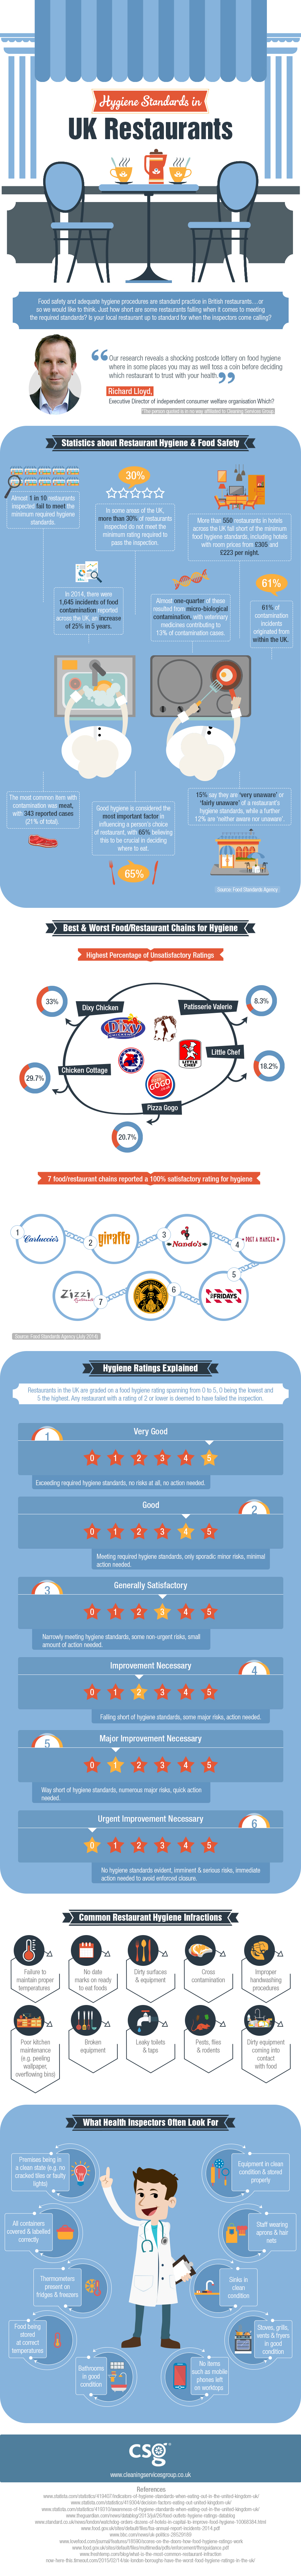 Hygiene Standards in UK Restaurants [Infographic]   ecogreenlove